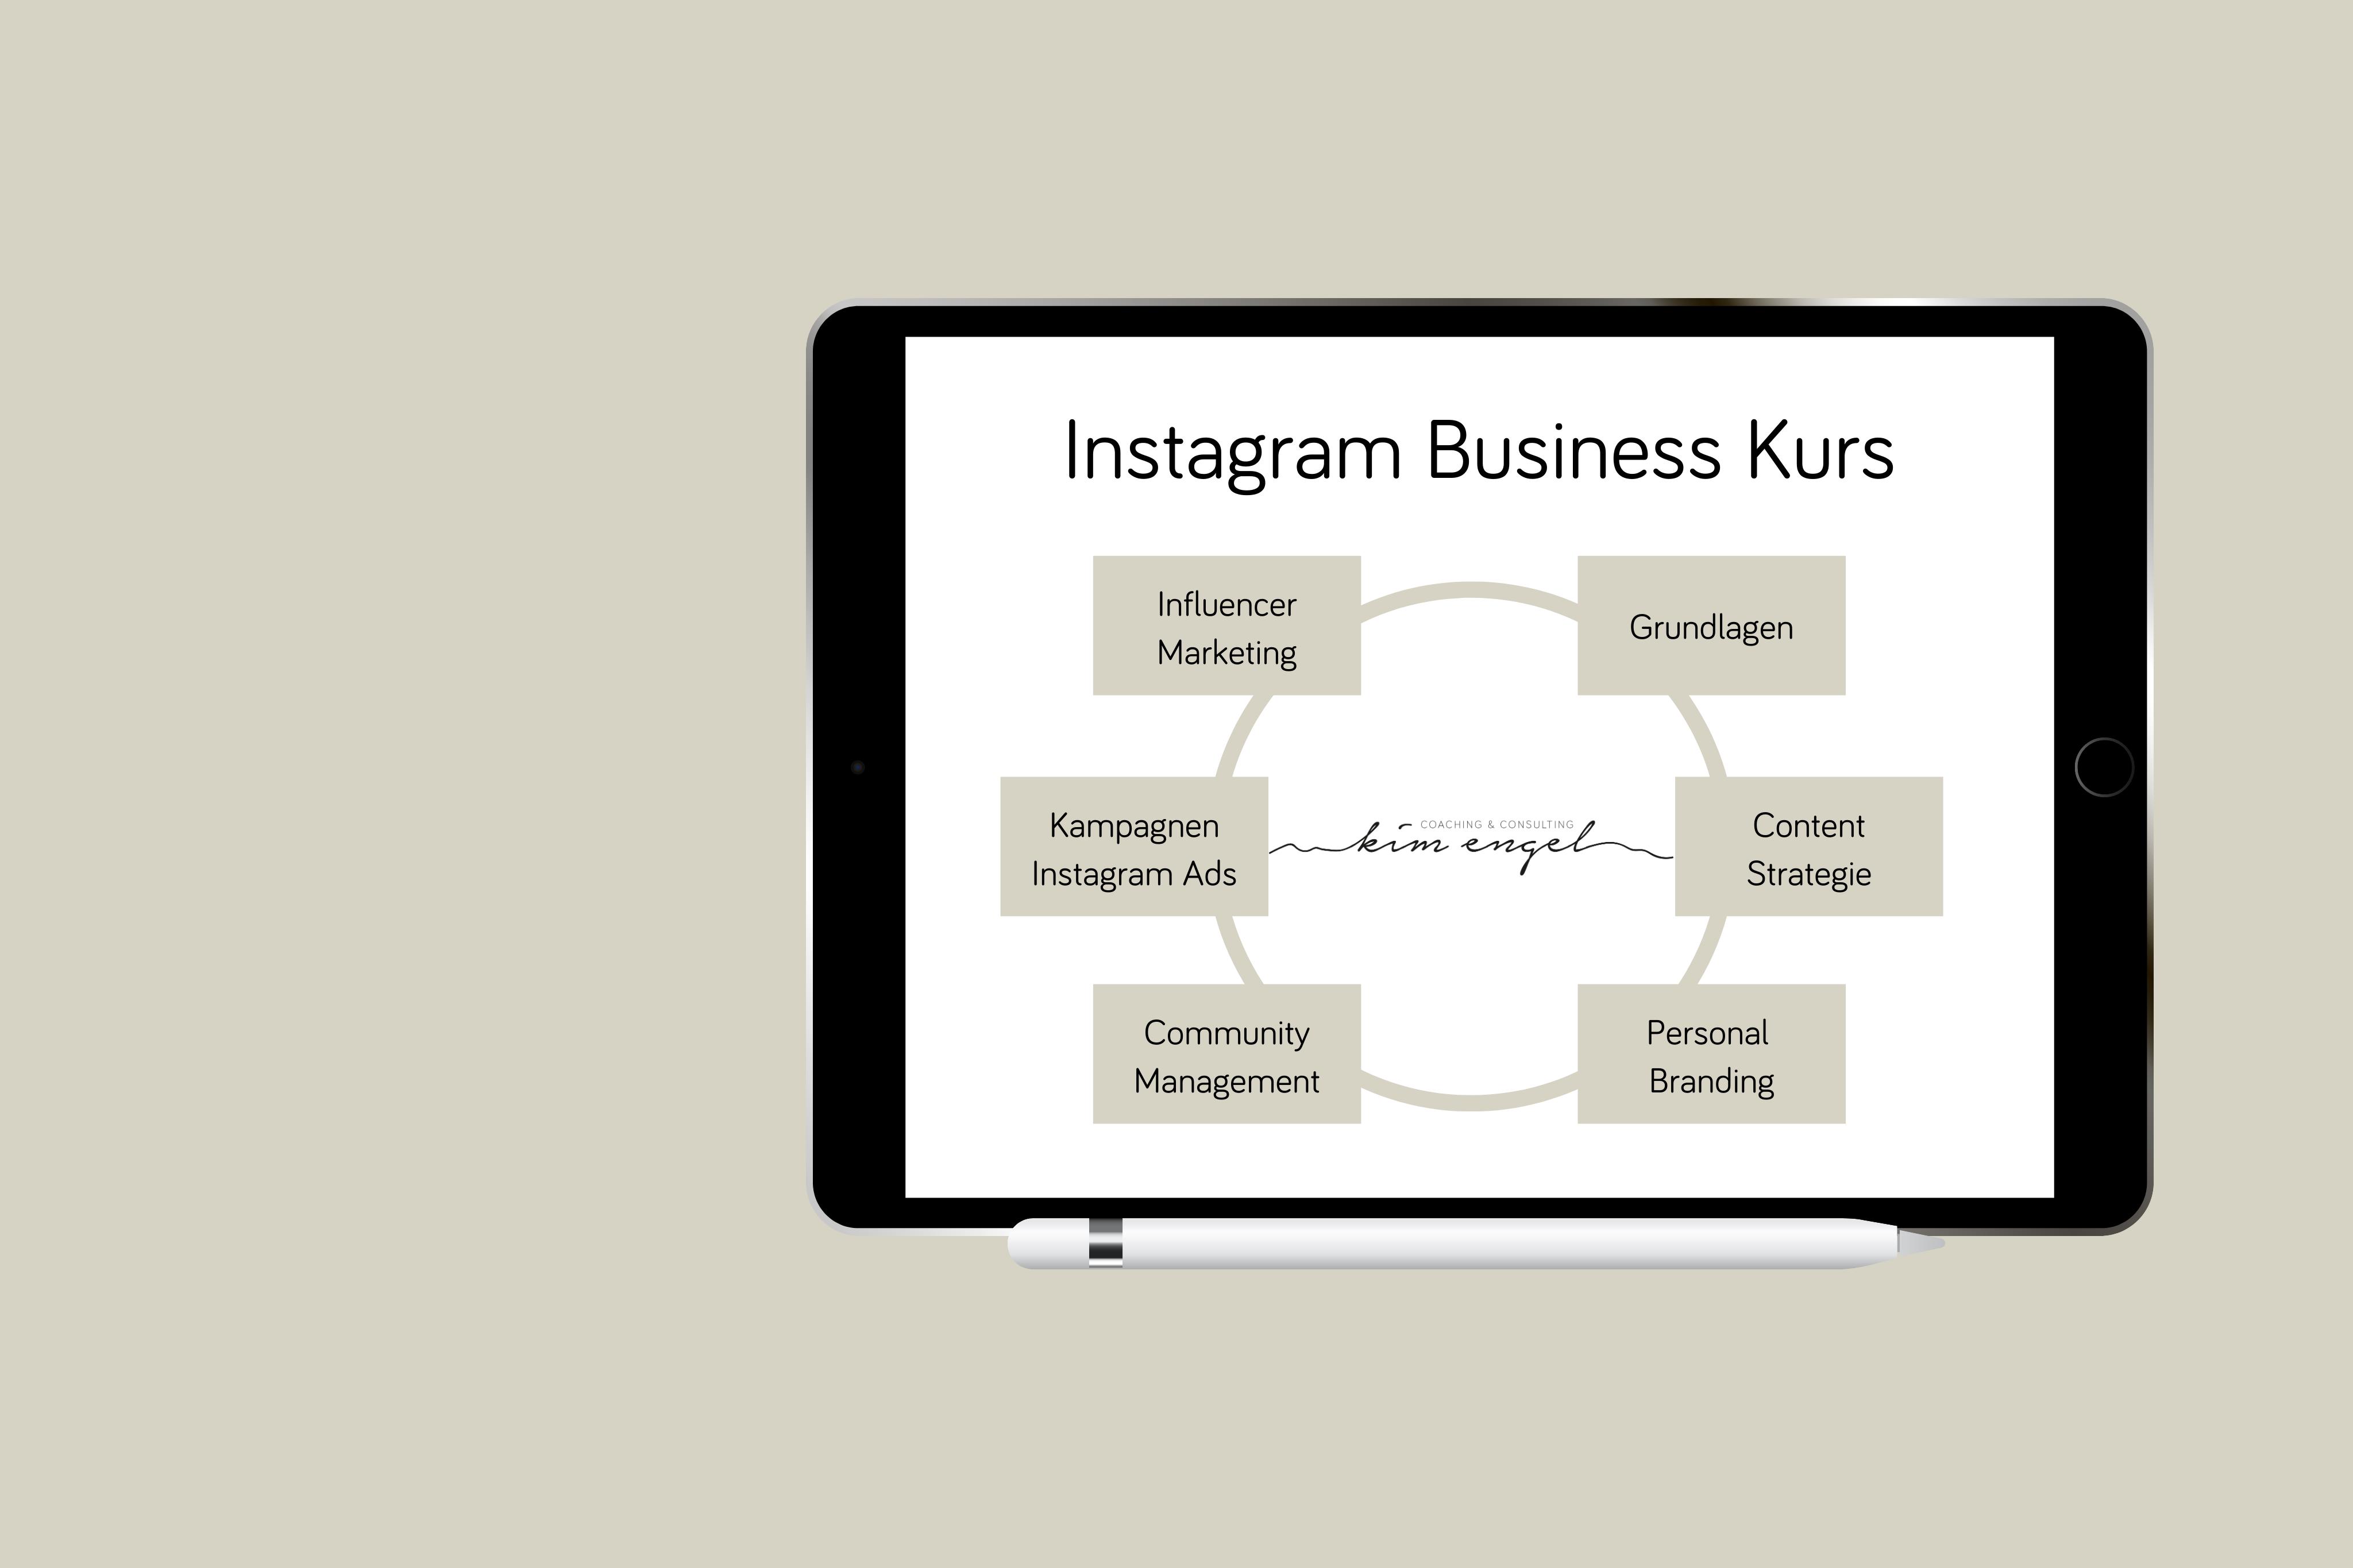 Instagram Business Kurs